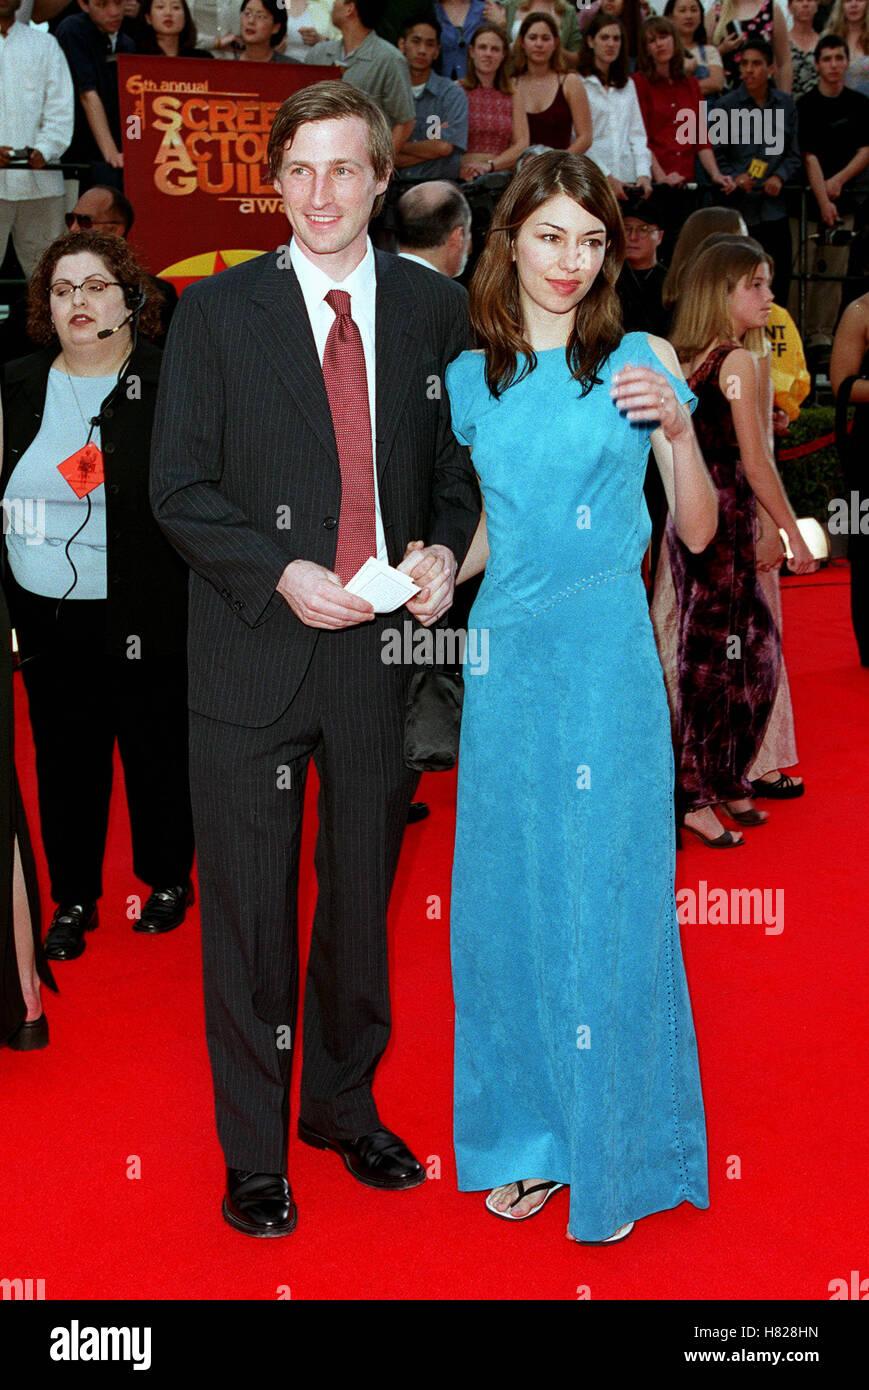 SPIKE JONZE & SOPHIA COPPOLA LOS ANGELES USA 12 March 2000